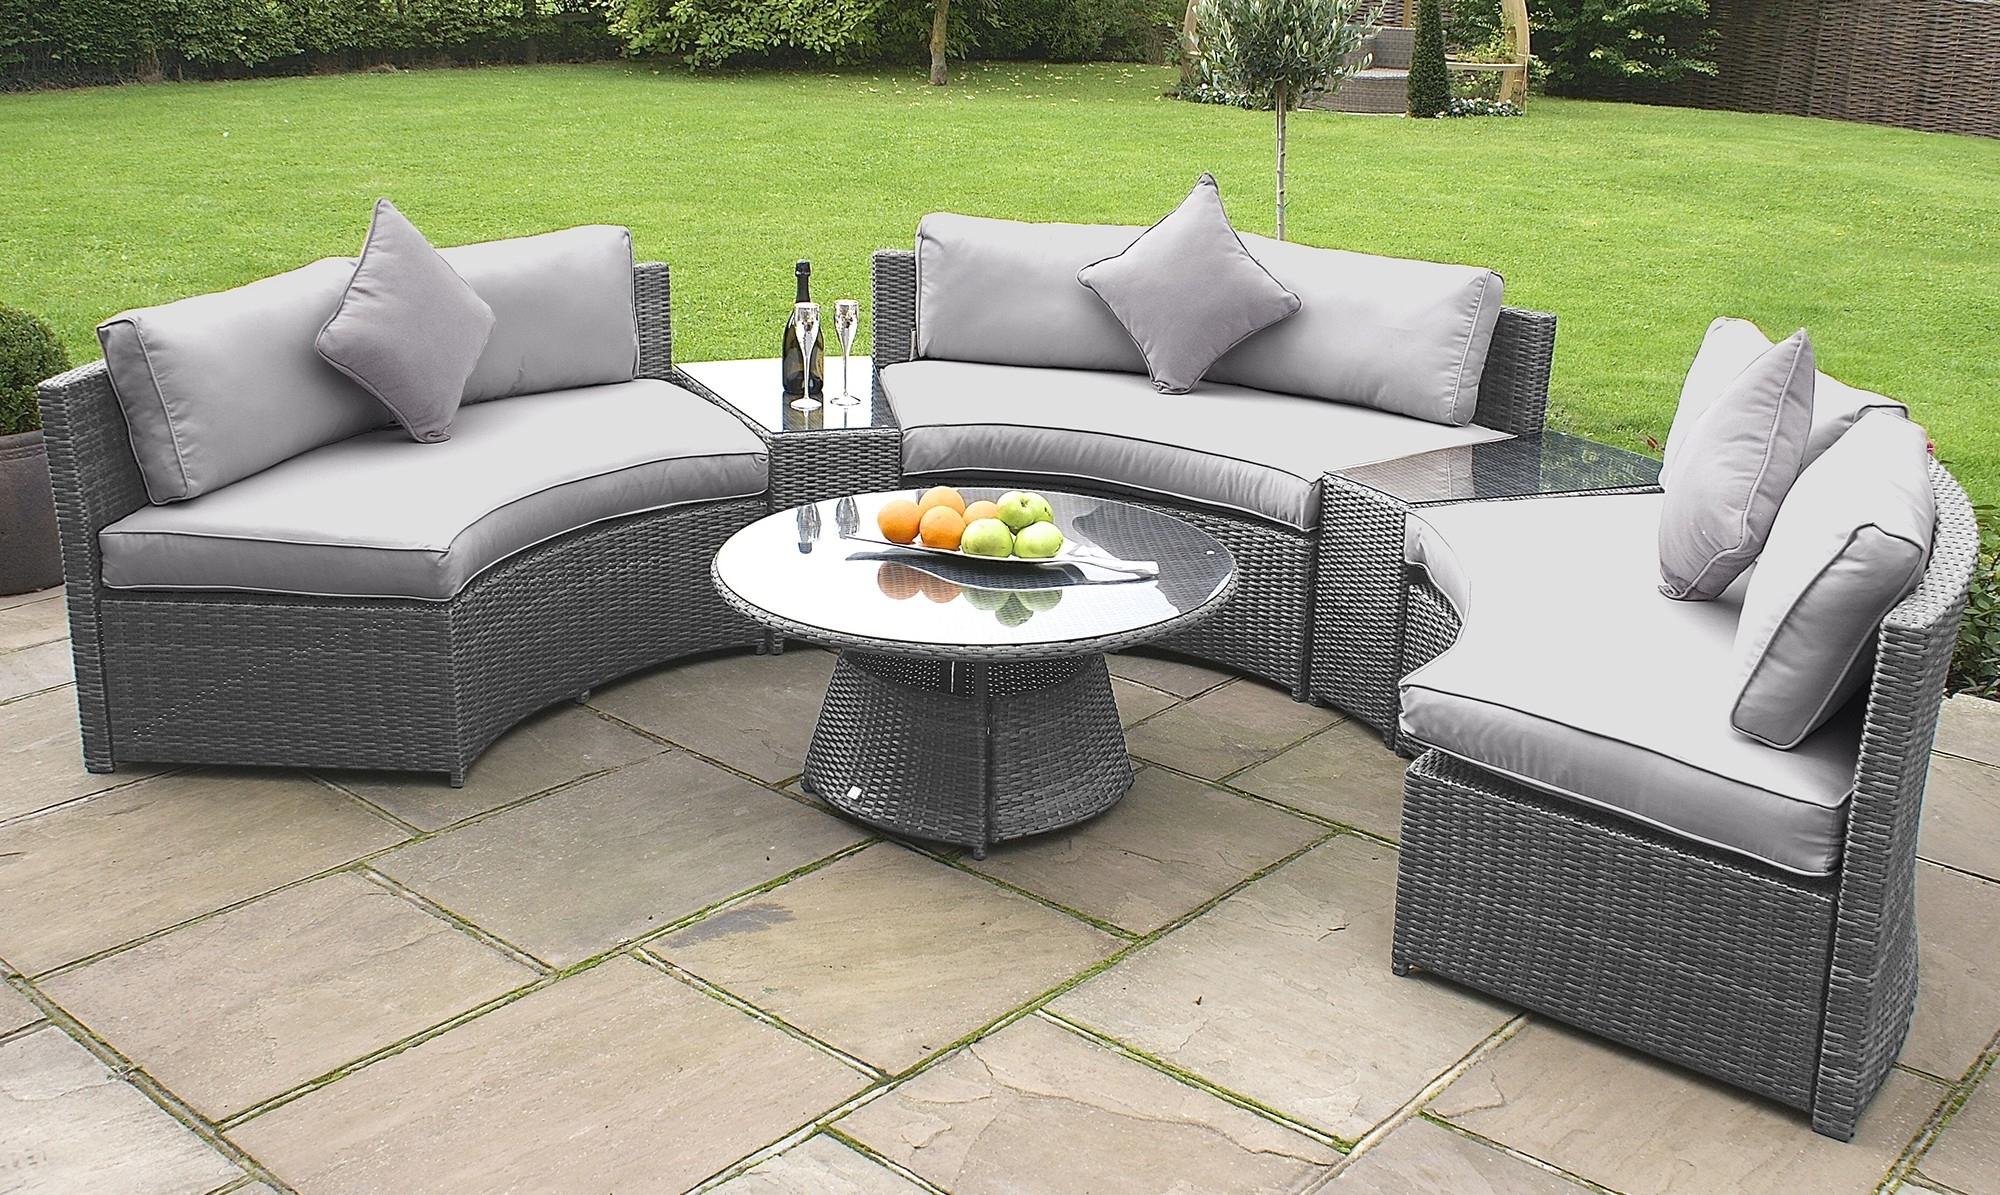 Enormous Gray Wicker Outdoor Furniture Attractive Grey Patio Fresh Pertaining To Recent Grey Patio Conversation Sets (Gallery 4 of 20)